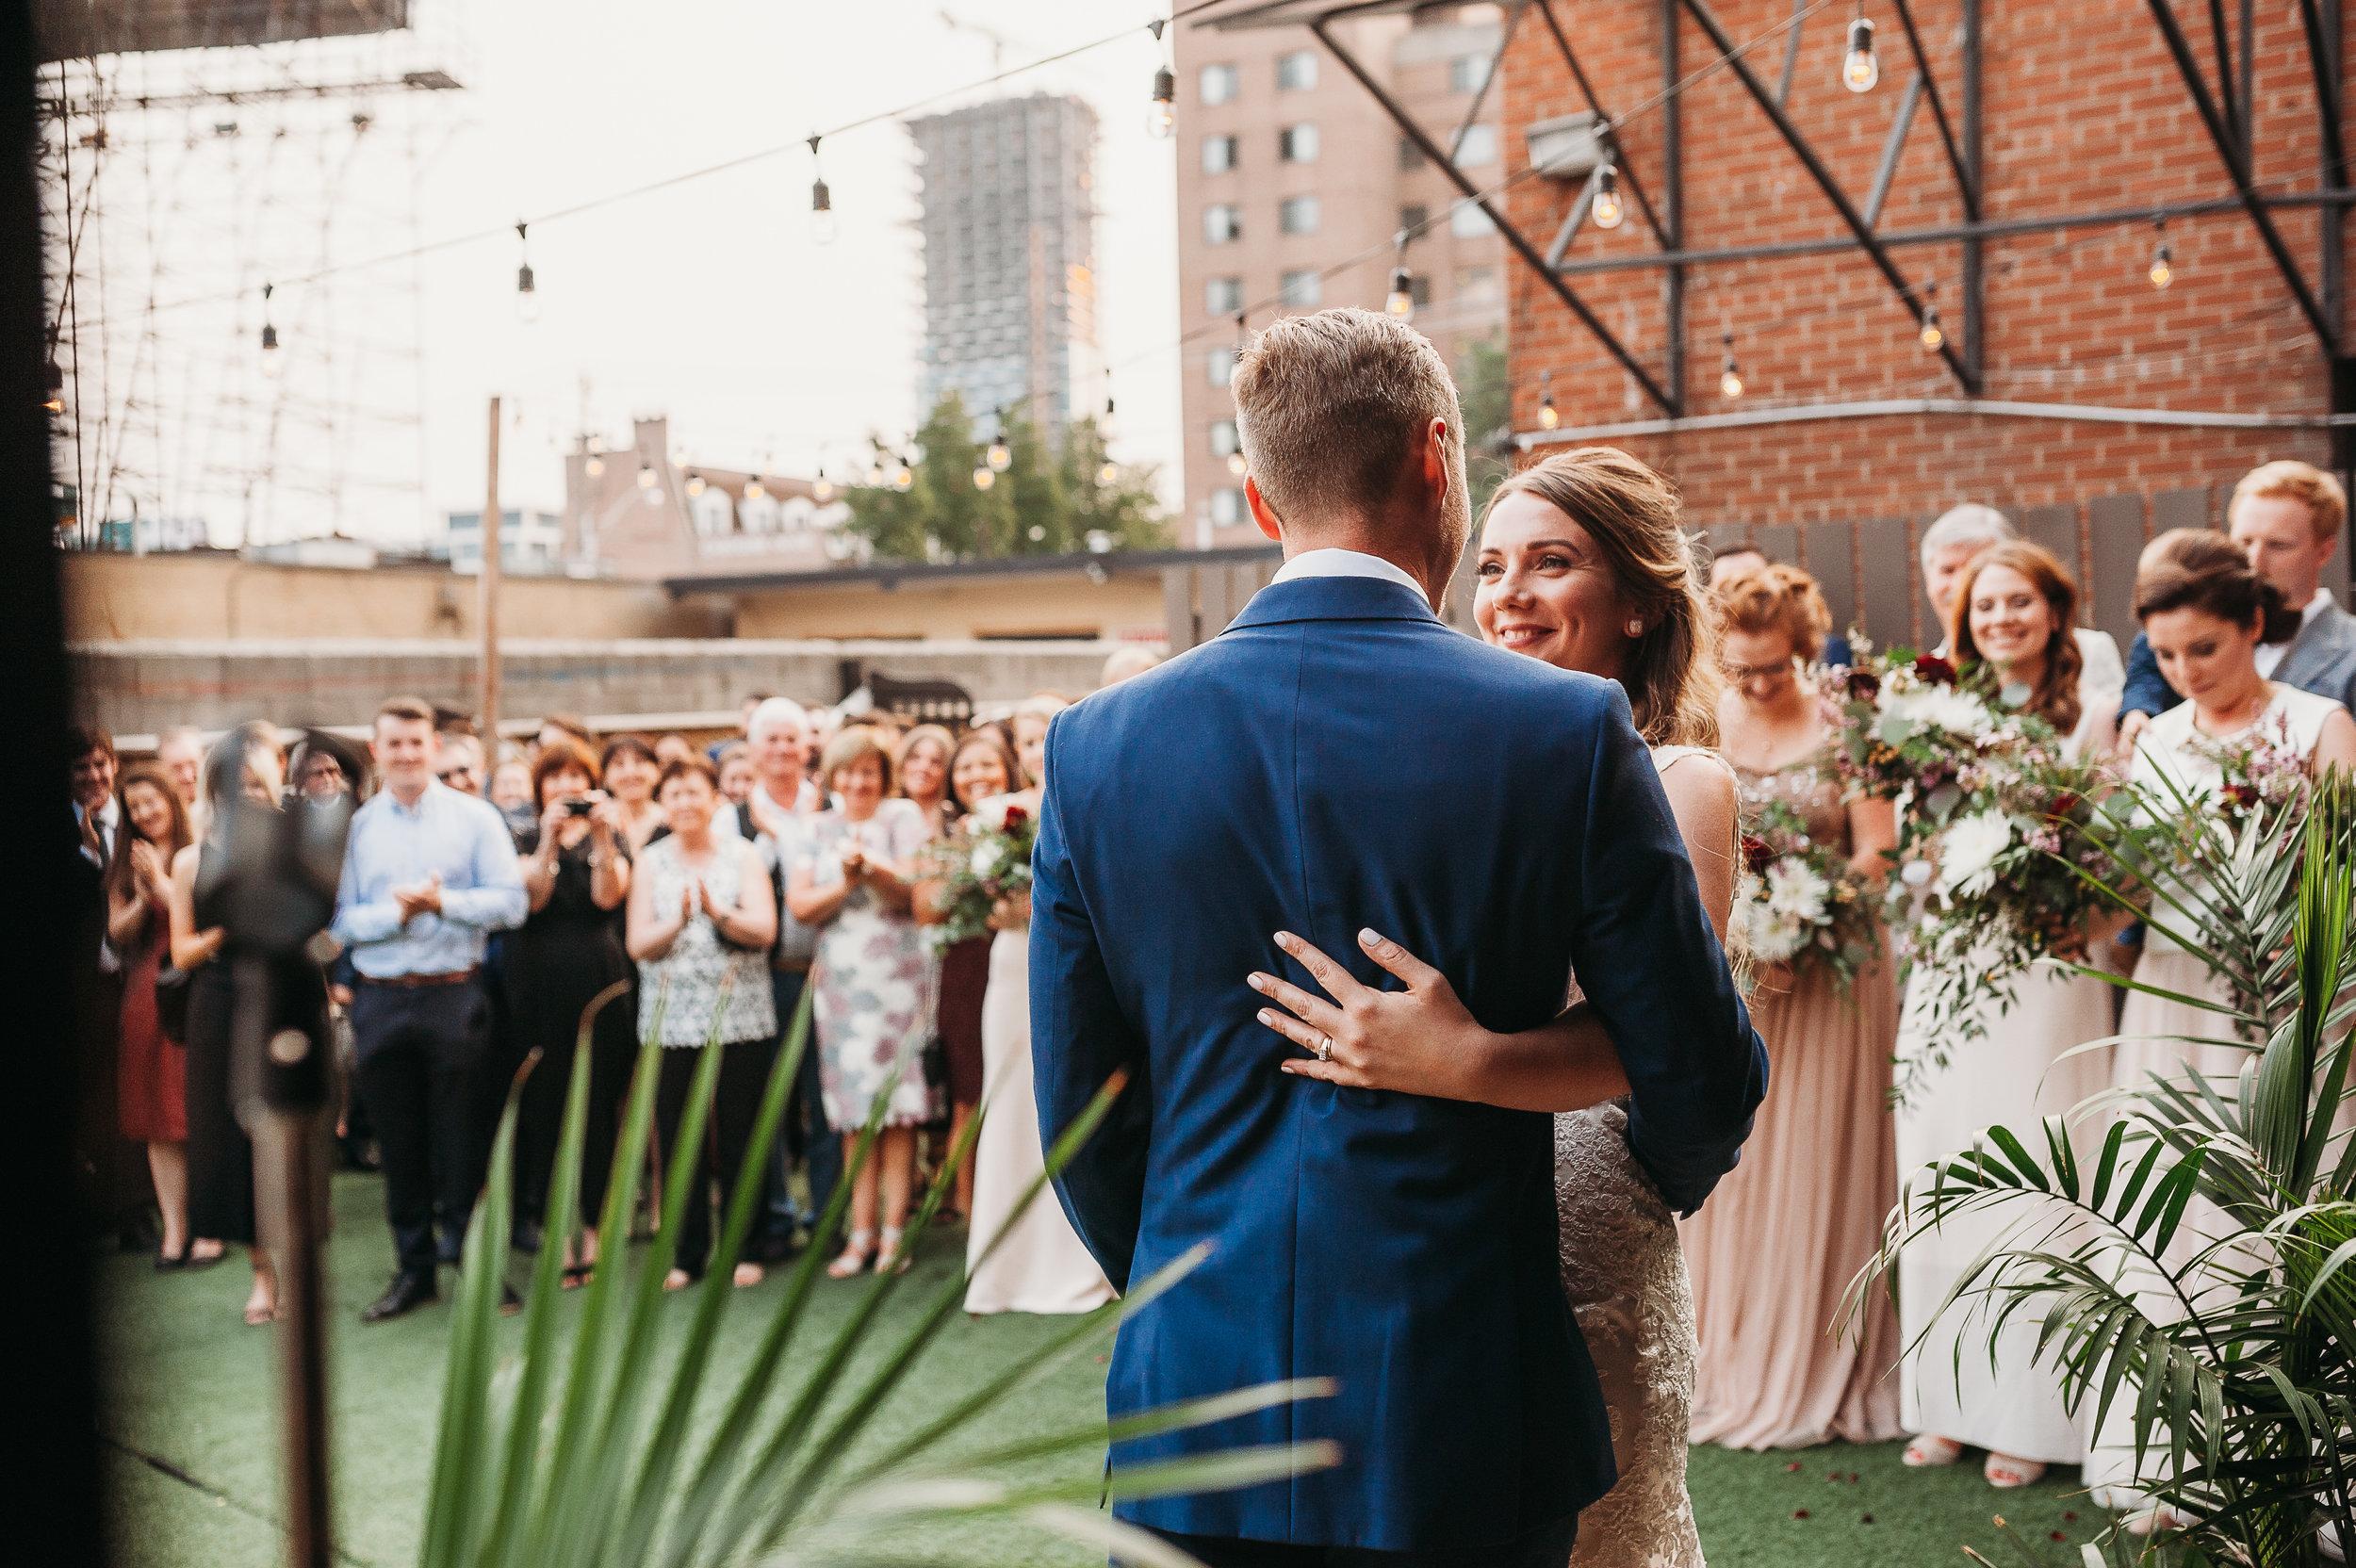 bride-groom-wedding-ceremony-first-kiss-toronto-rustic-boho-airship37-wedding-by-willow-birch-photo-toronto-documentary-wedding-photographers.jpg